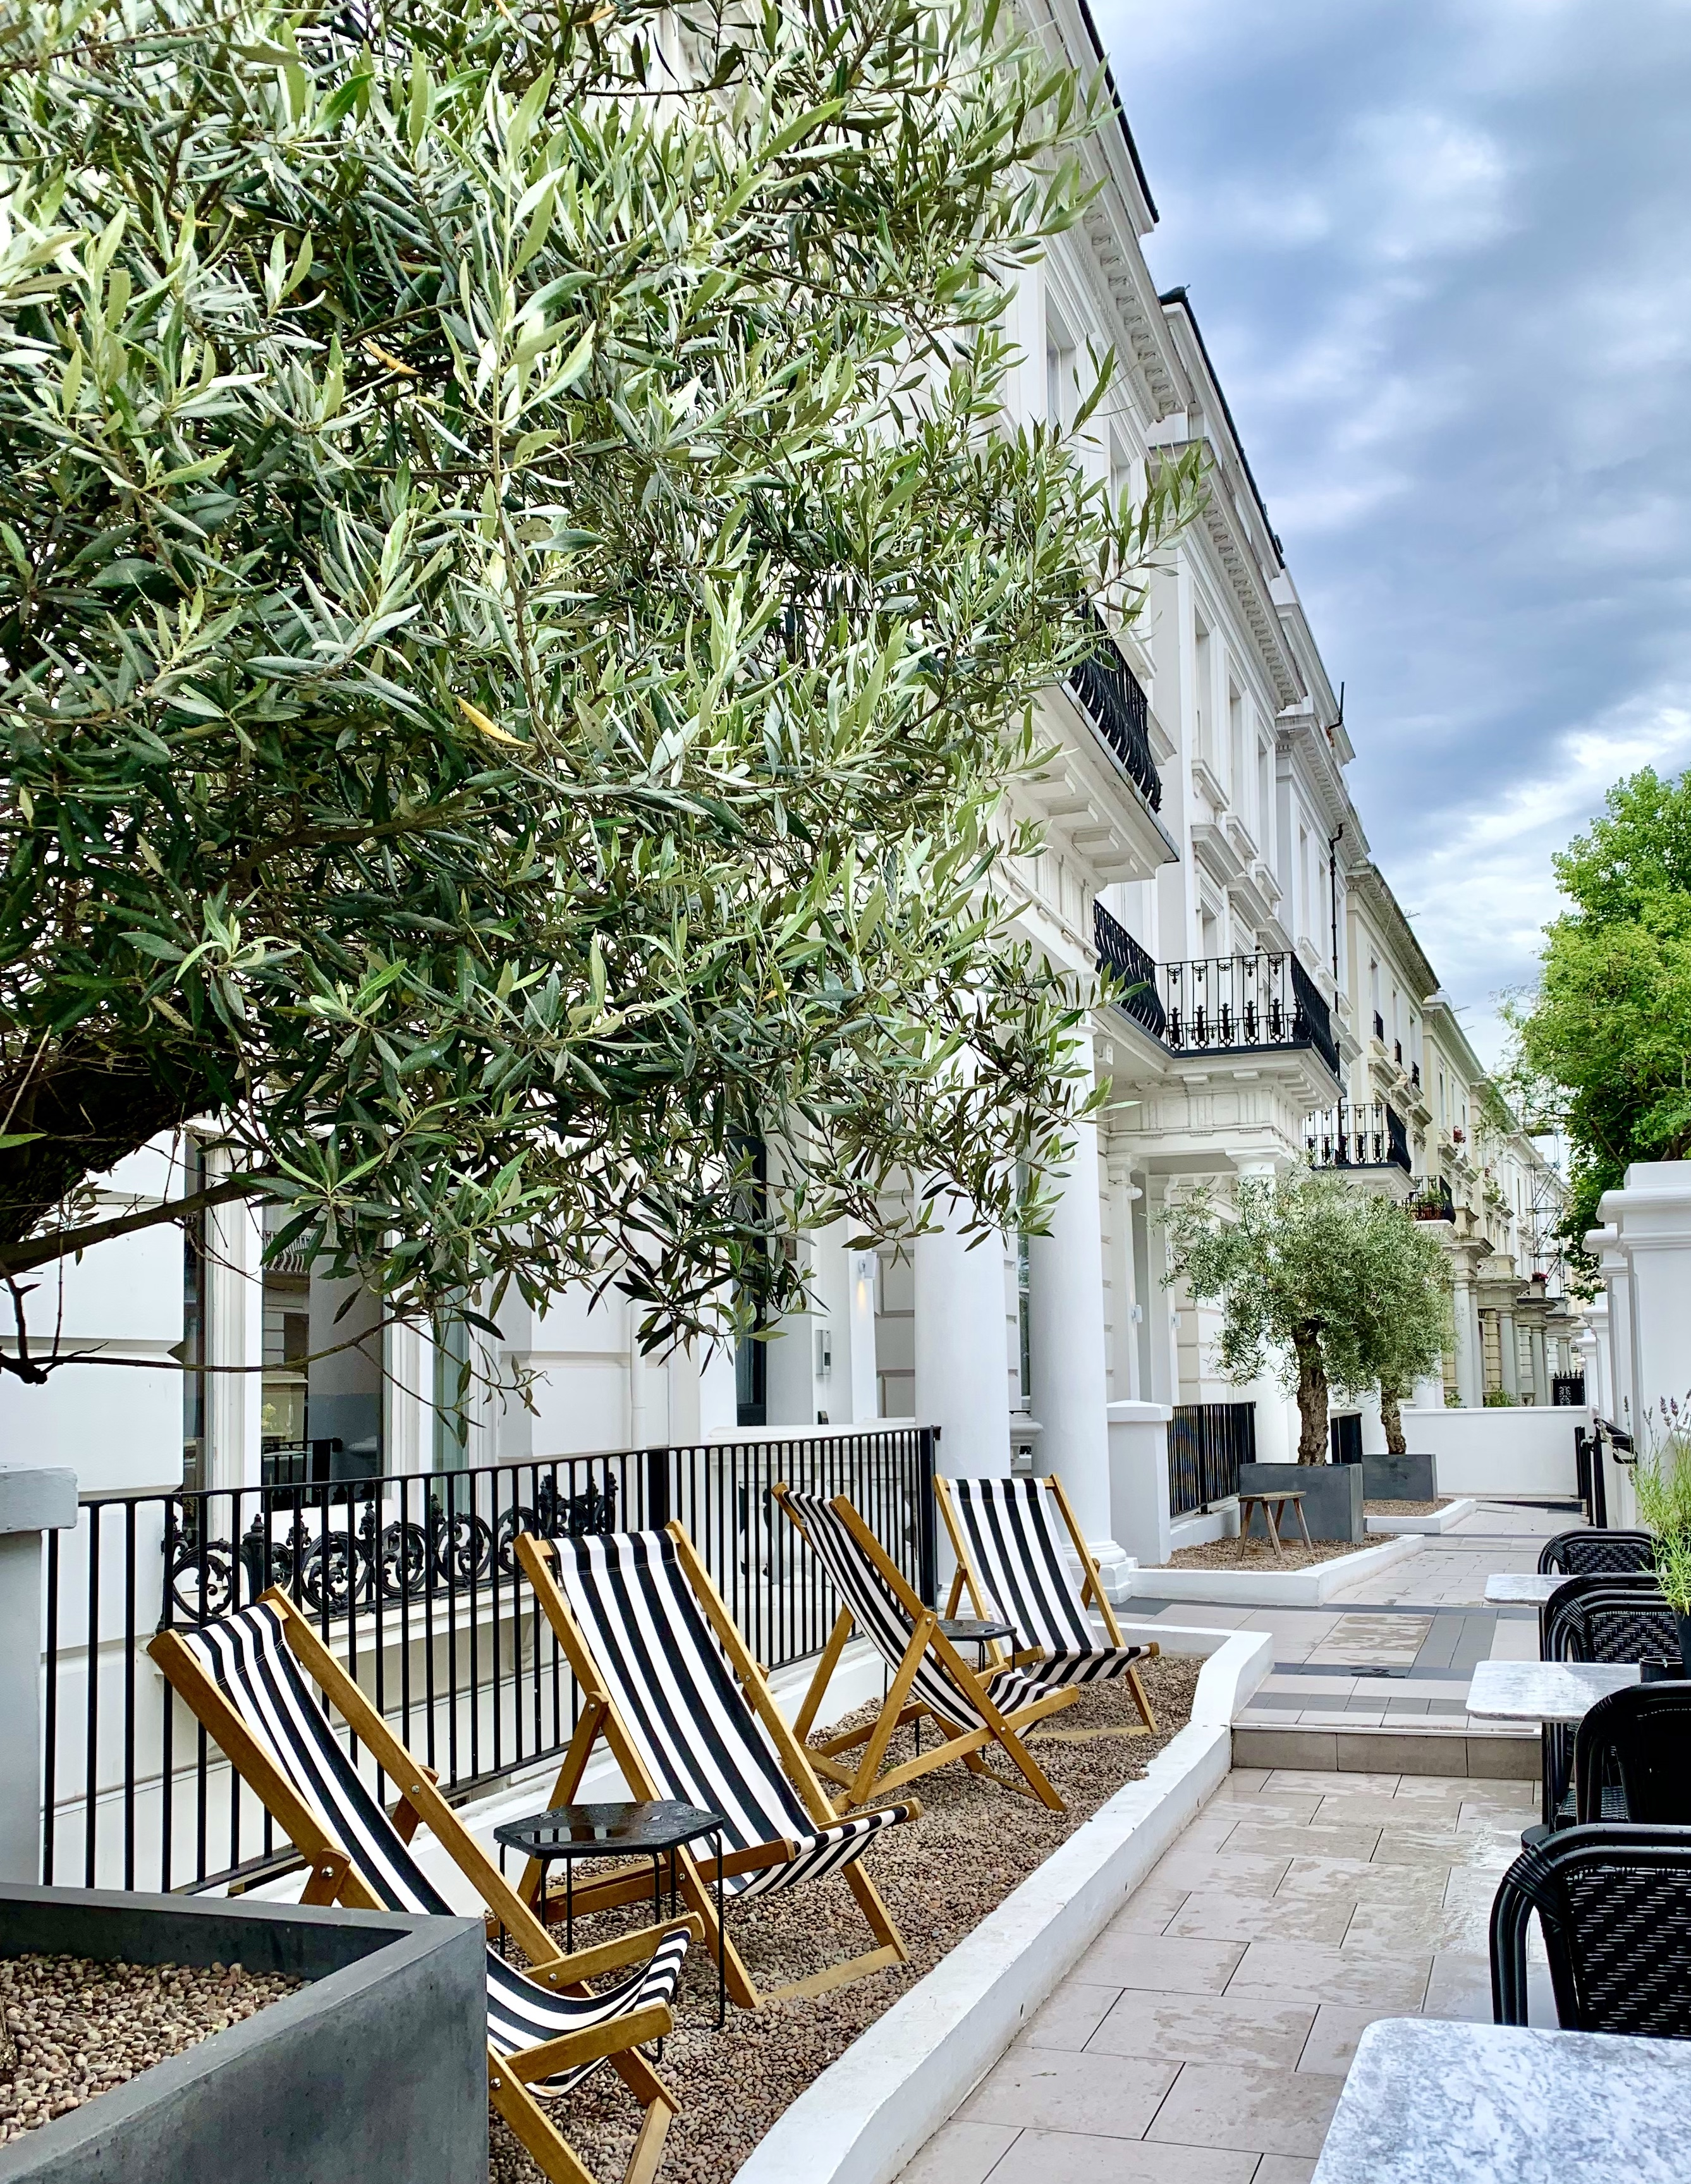 Notting-Hill-photo